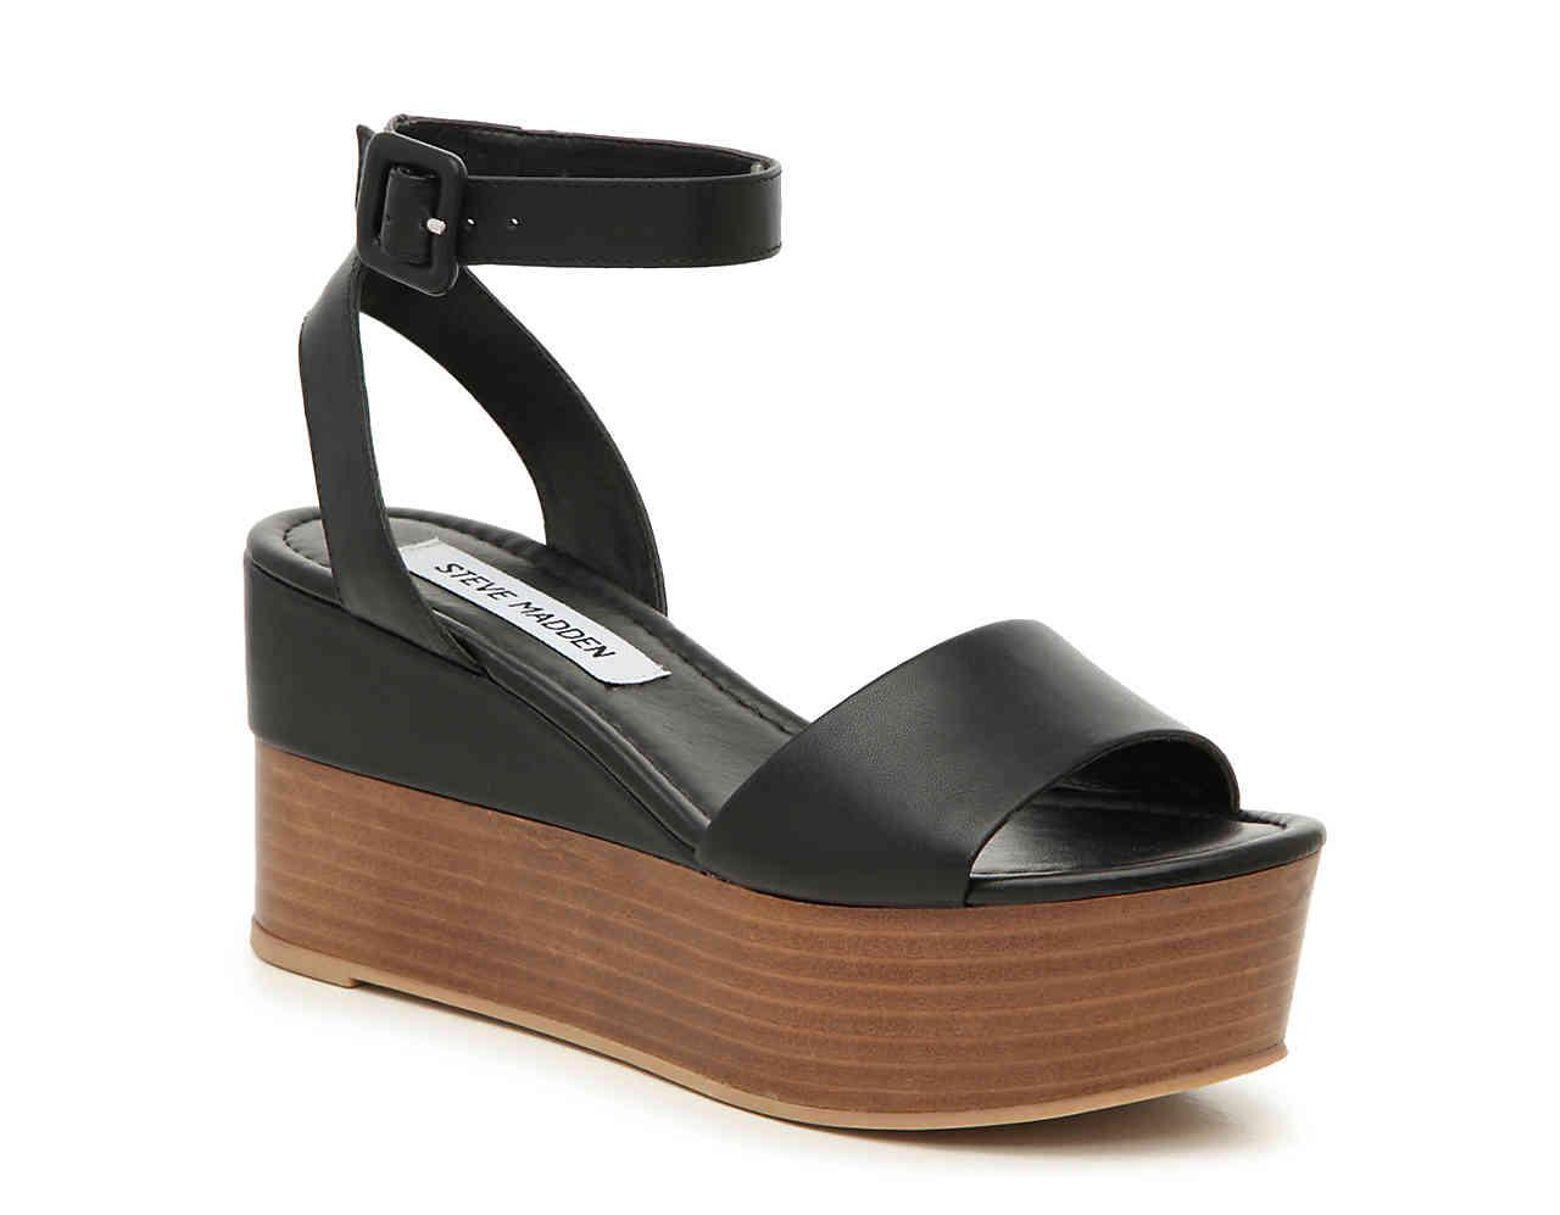 966dadc97d9 Women's Black Zilya Wedge Sandal